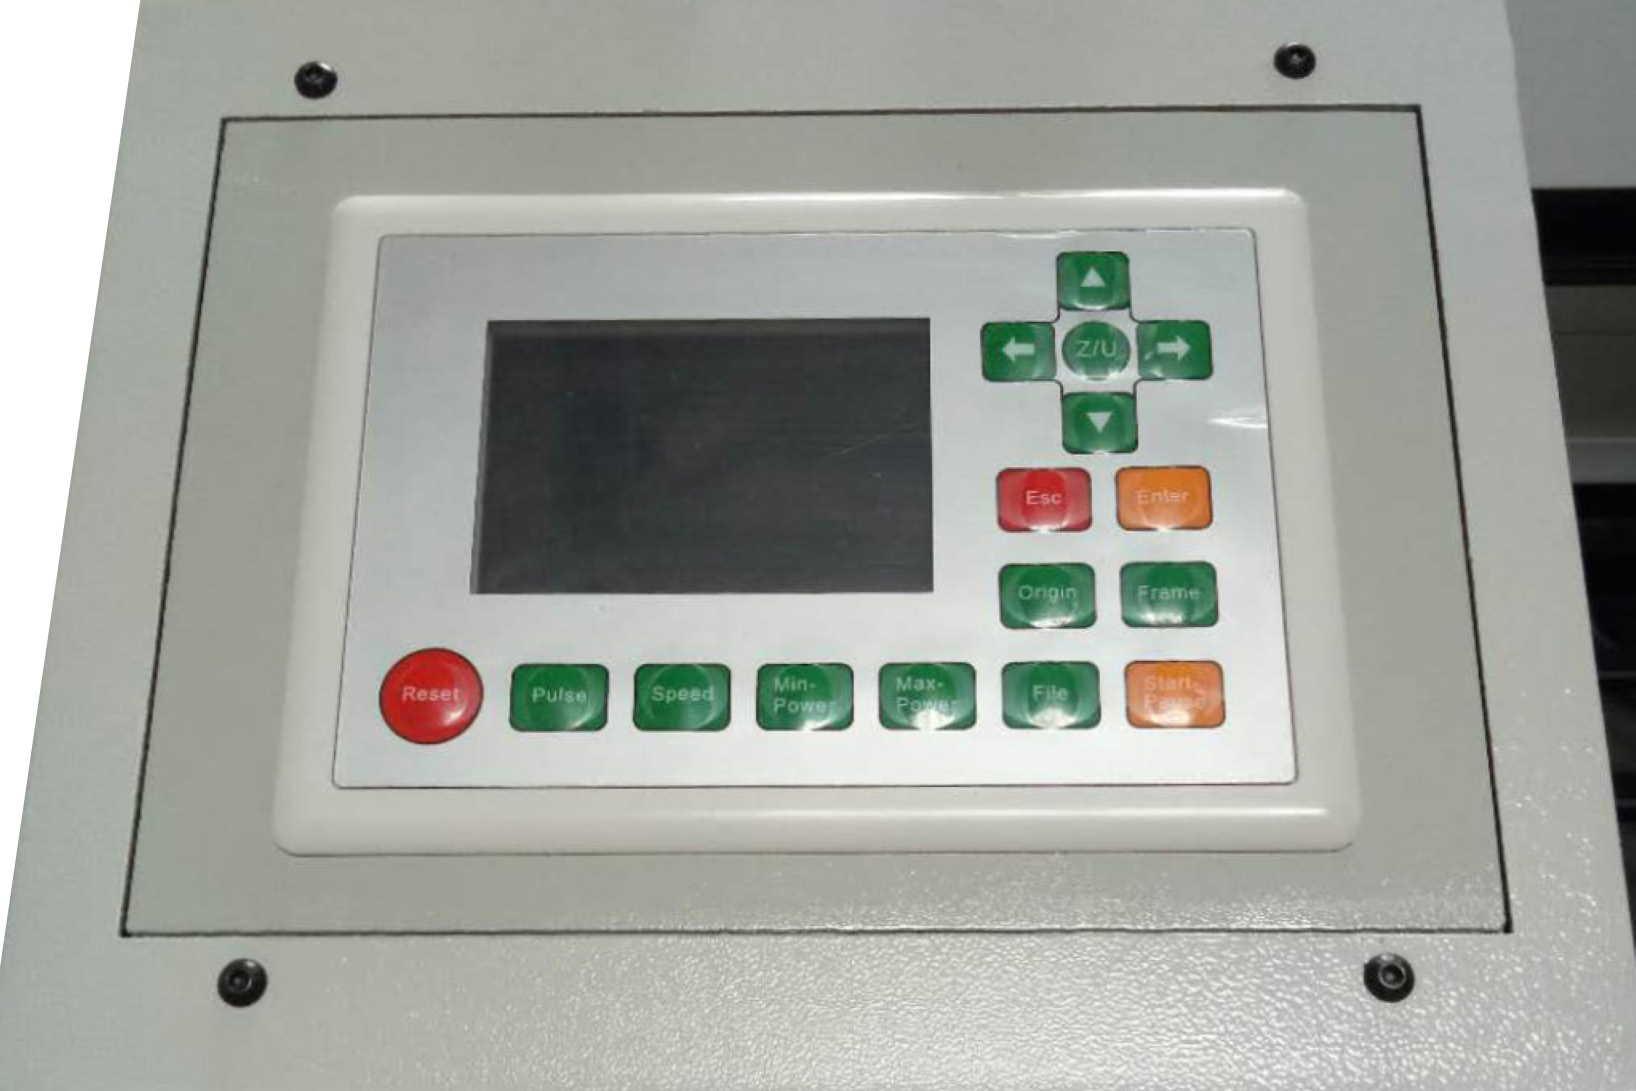 g1325-product-intro-img5